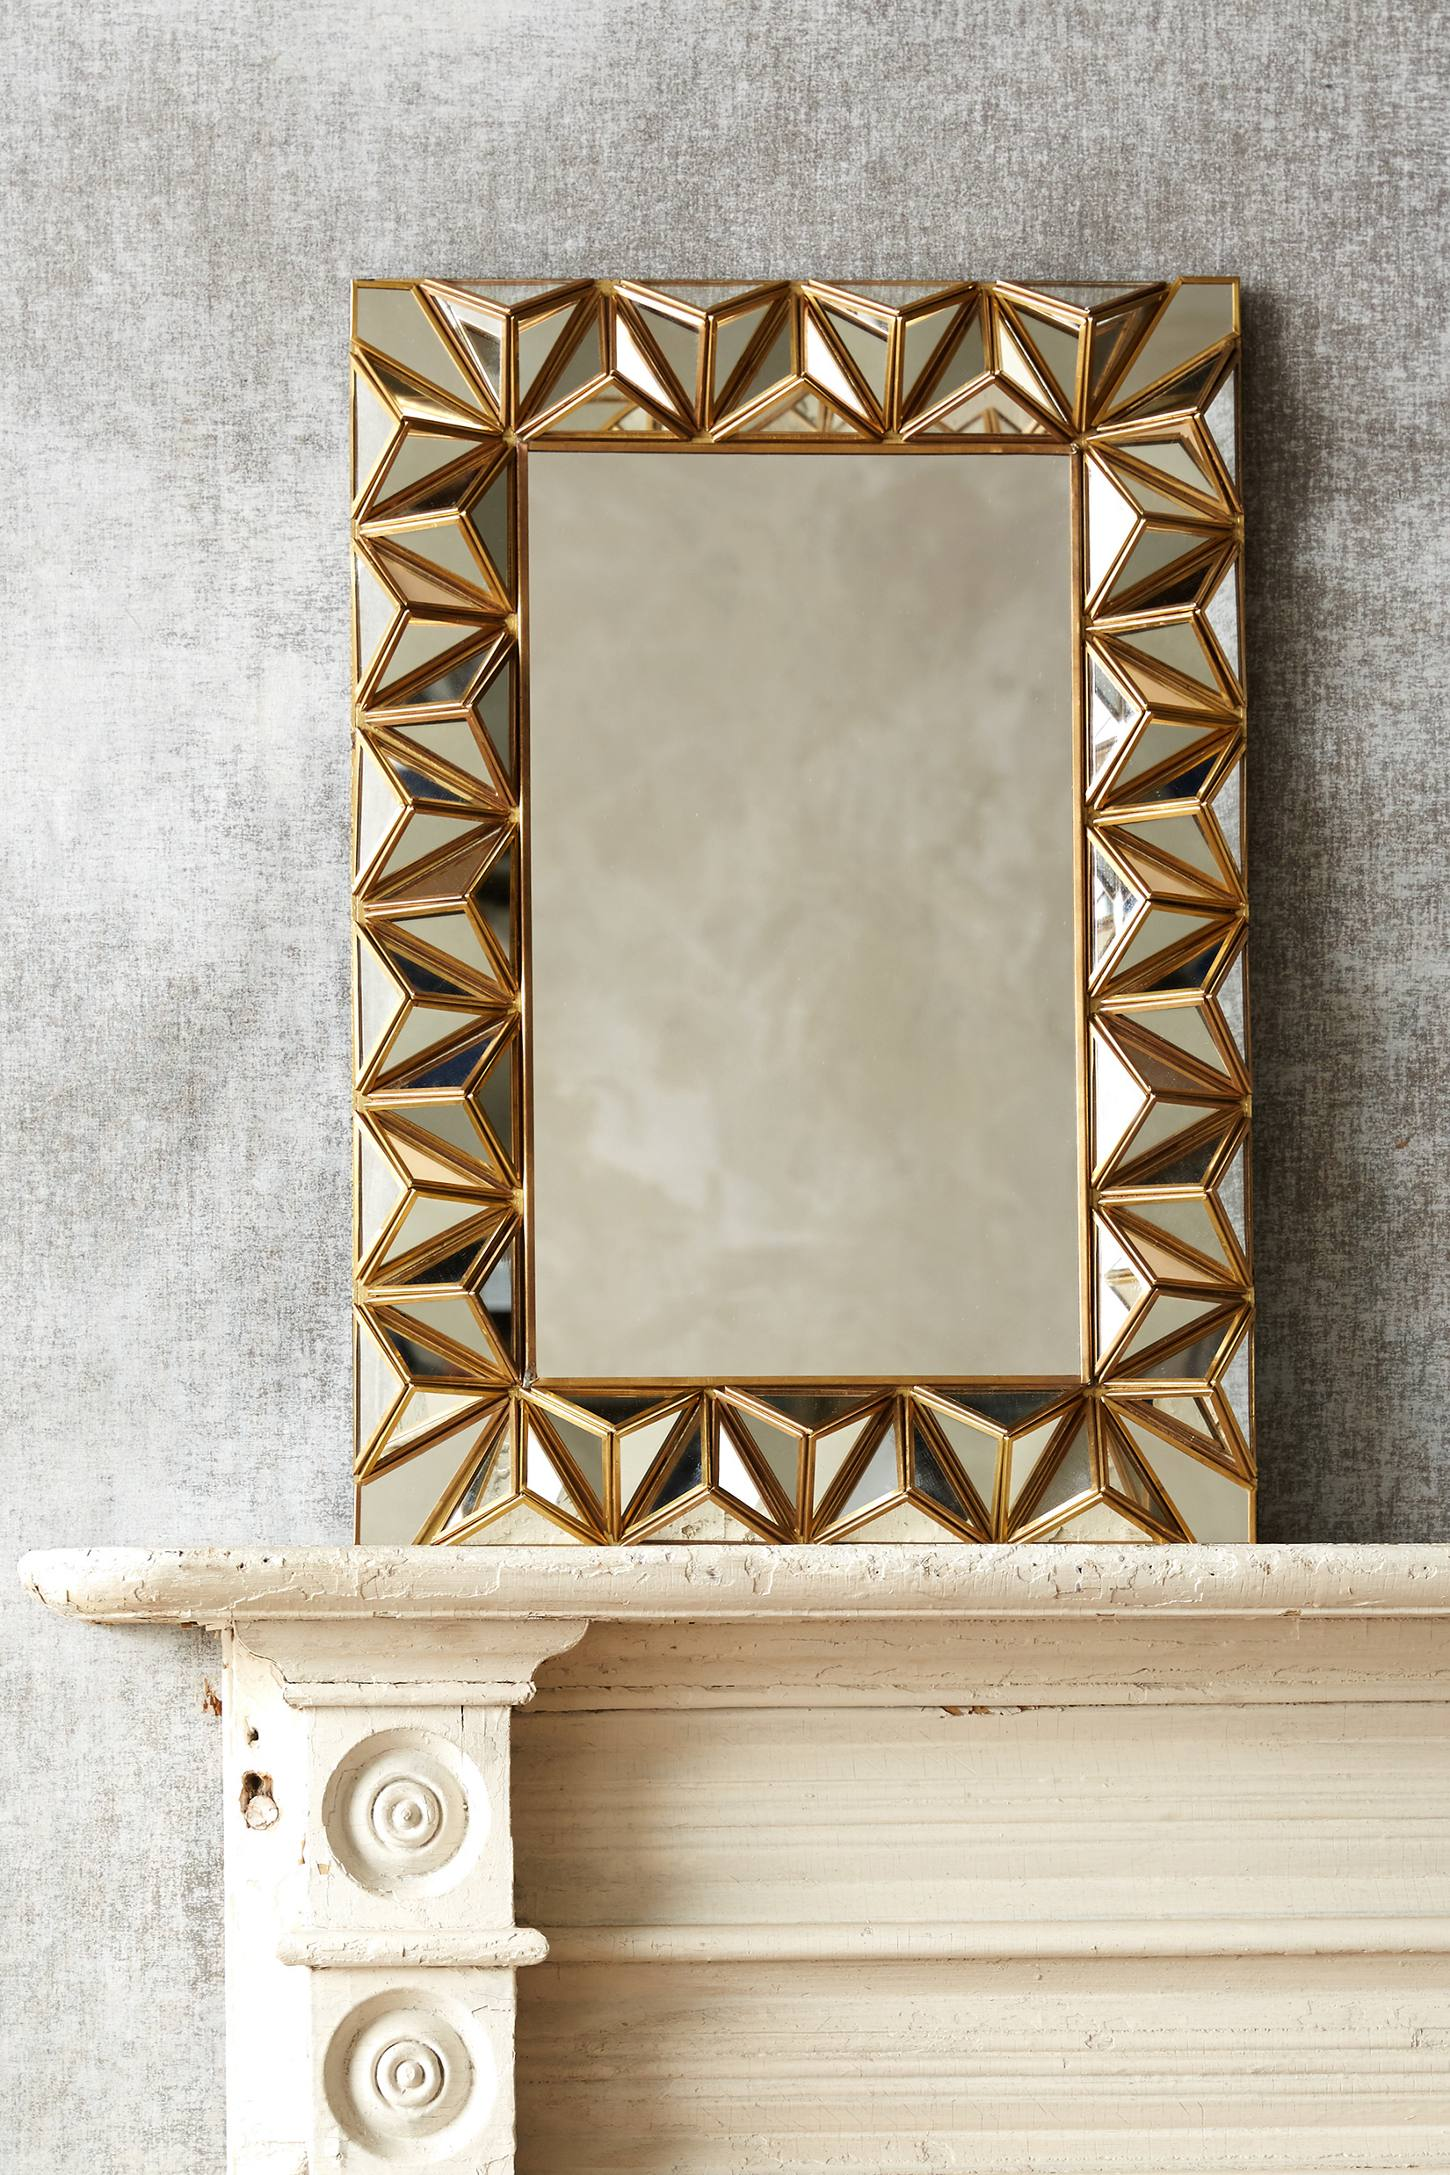 Studded Pyramid Mirror